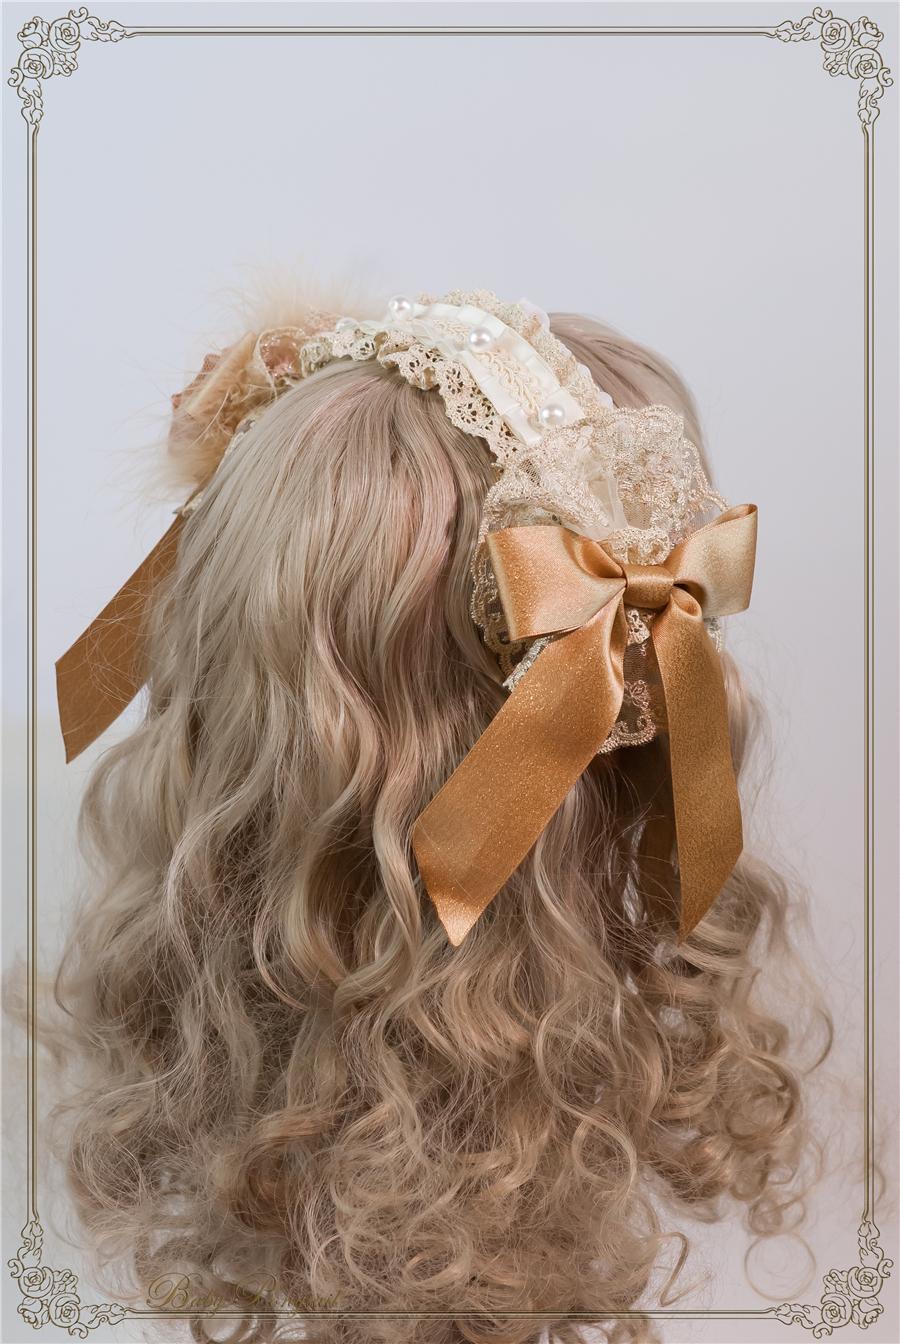 Baby Ponytail_Stock photo_Circus Princess_Rose Head Dress Golden_08.jpg